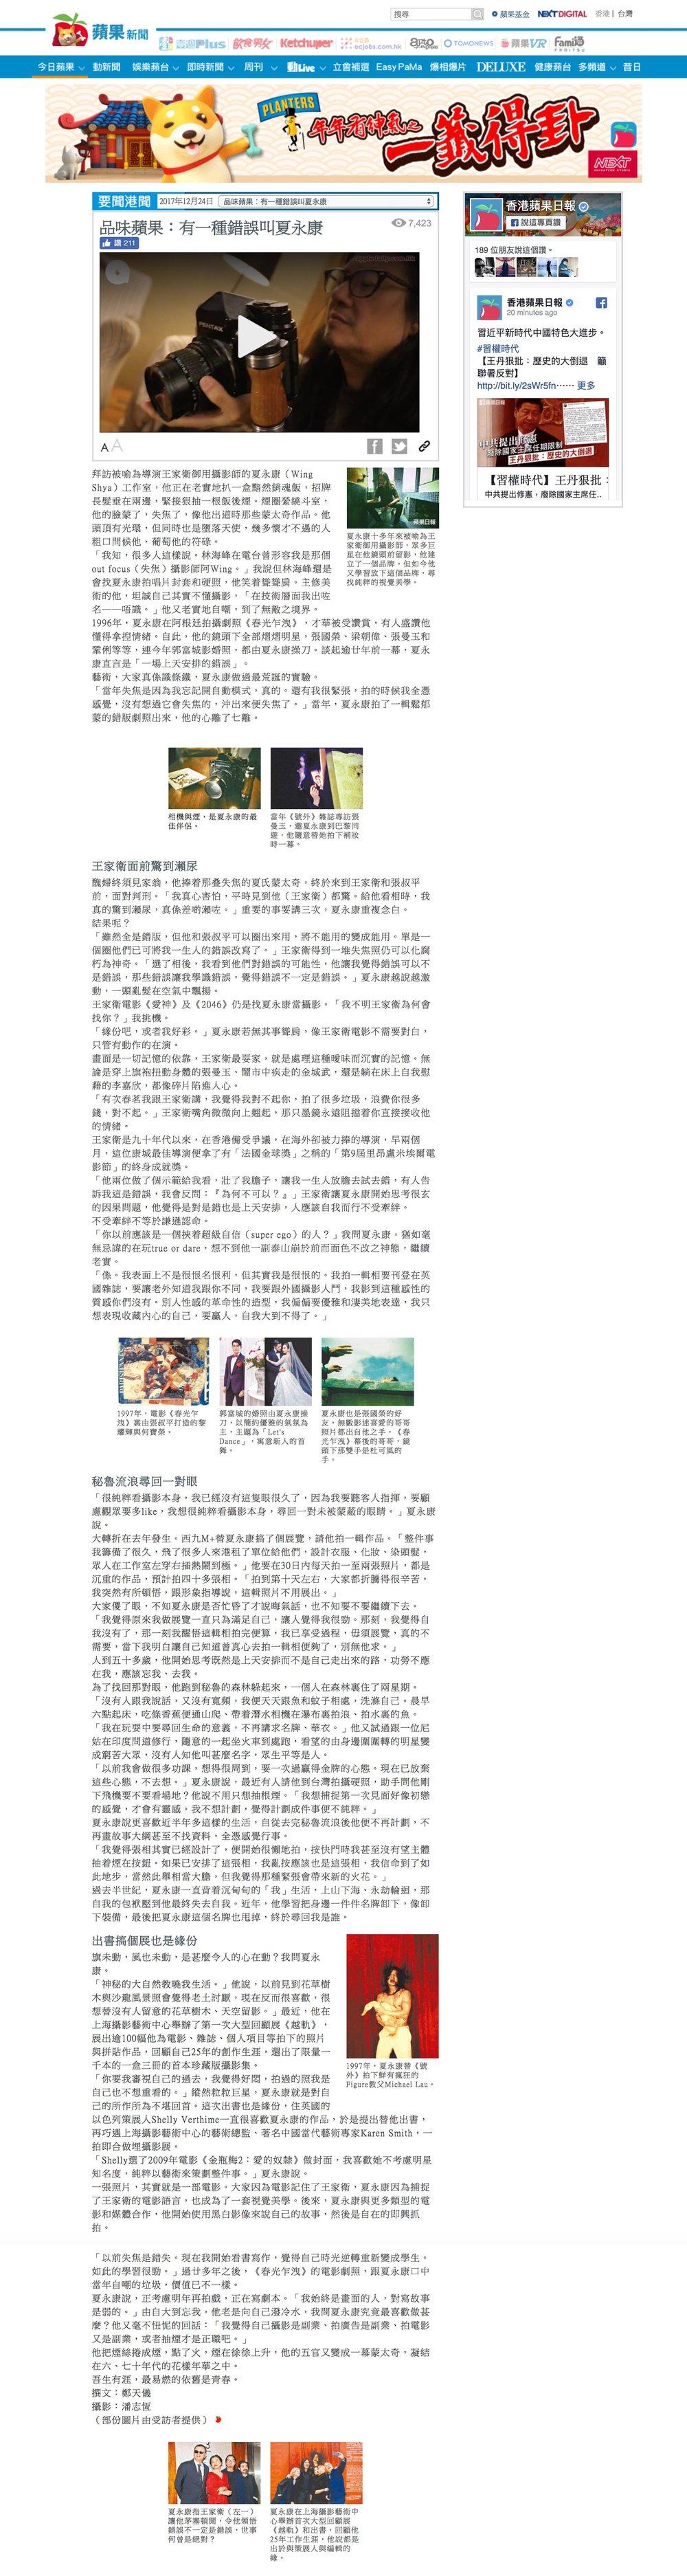 Apple Daily 蘋果新聞 .jpg